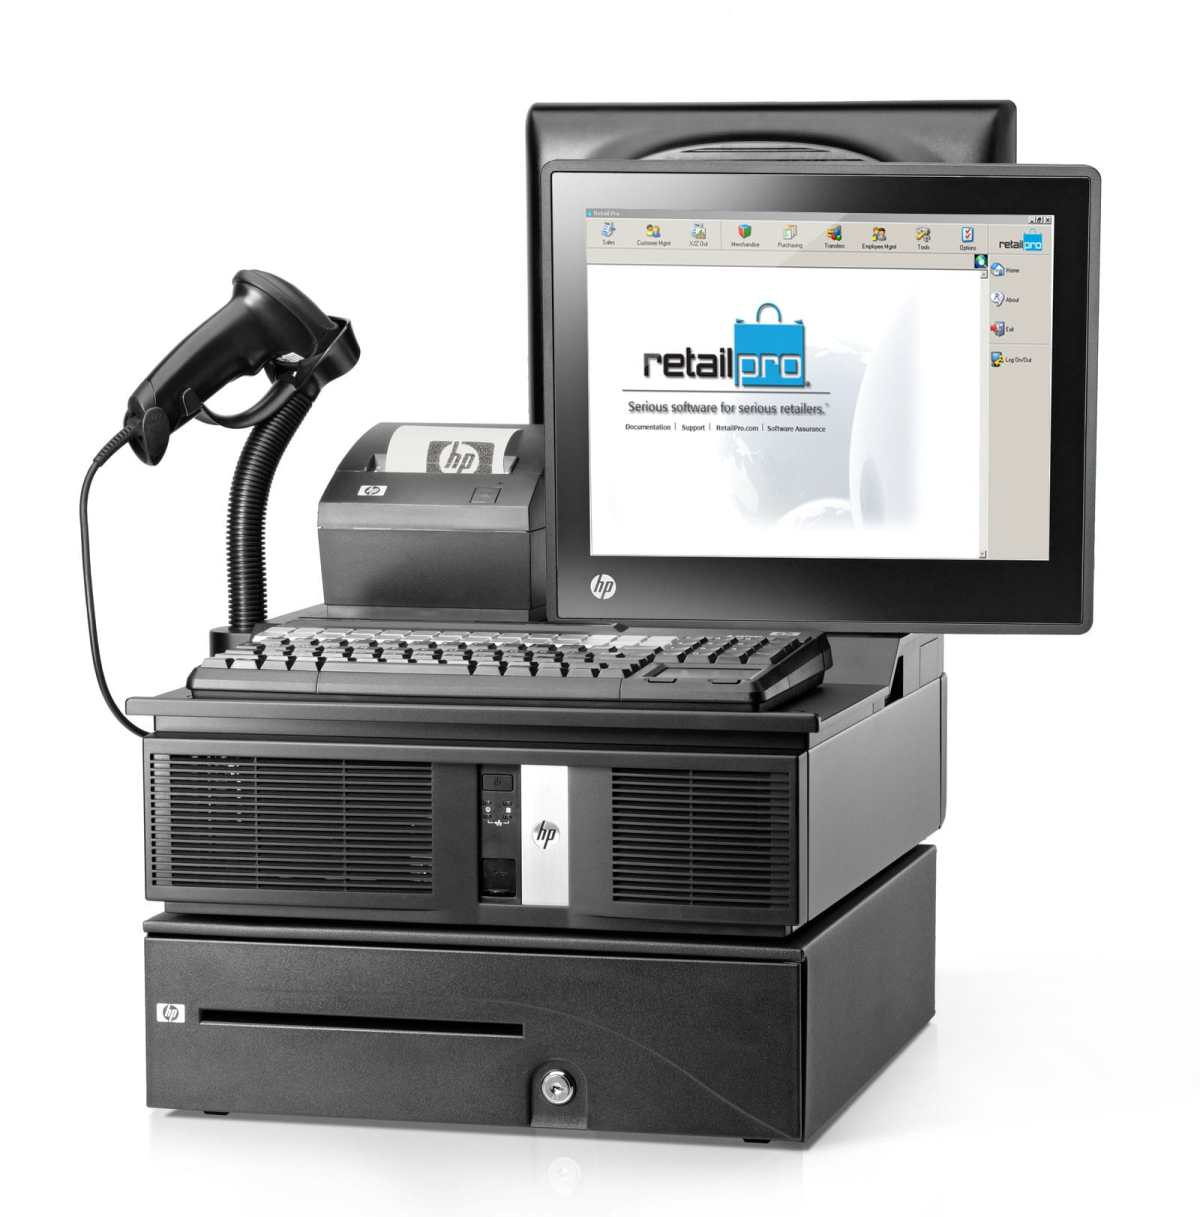 HP-Retail-Pro